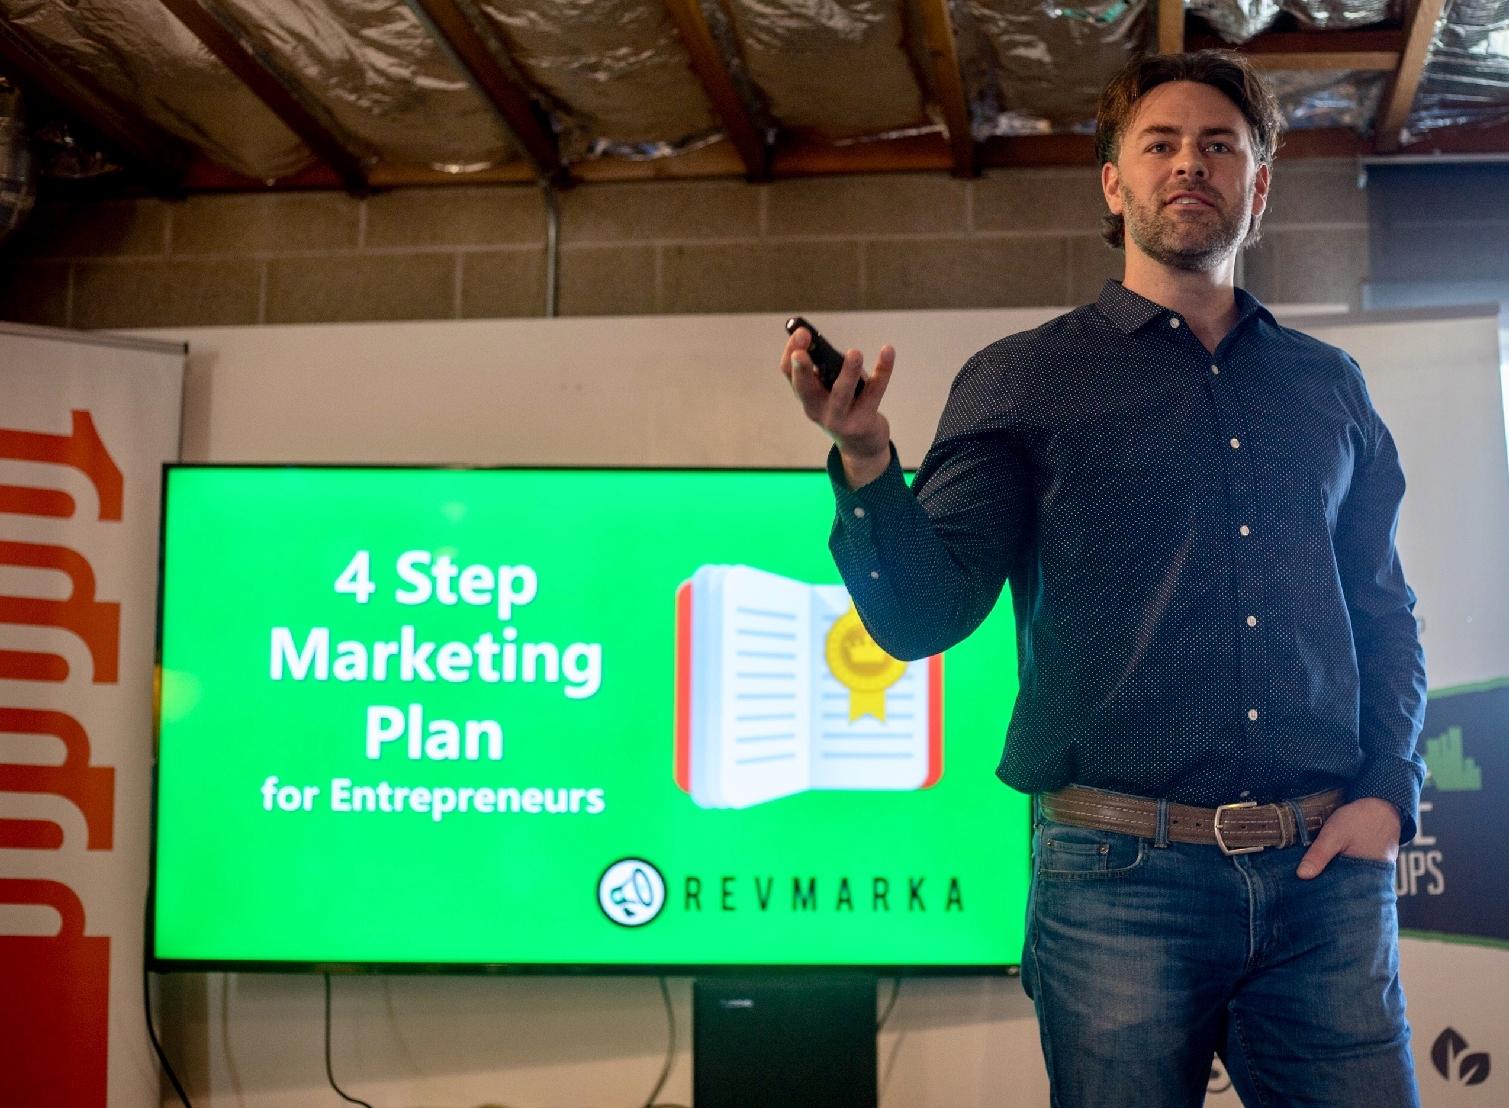 Eric Dahl presenting the 4 Step Marketing Plan for Entrepreneurs. Aug. 15, 2018 (photo credit: C. Federer)